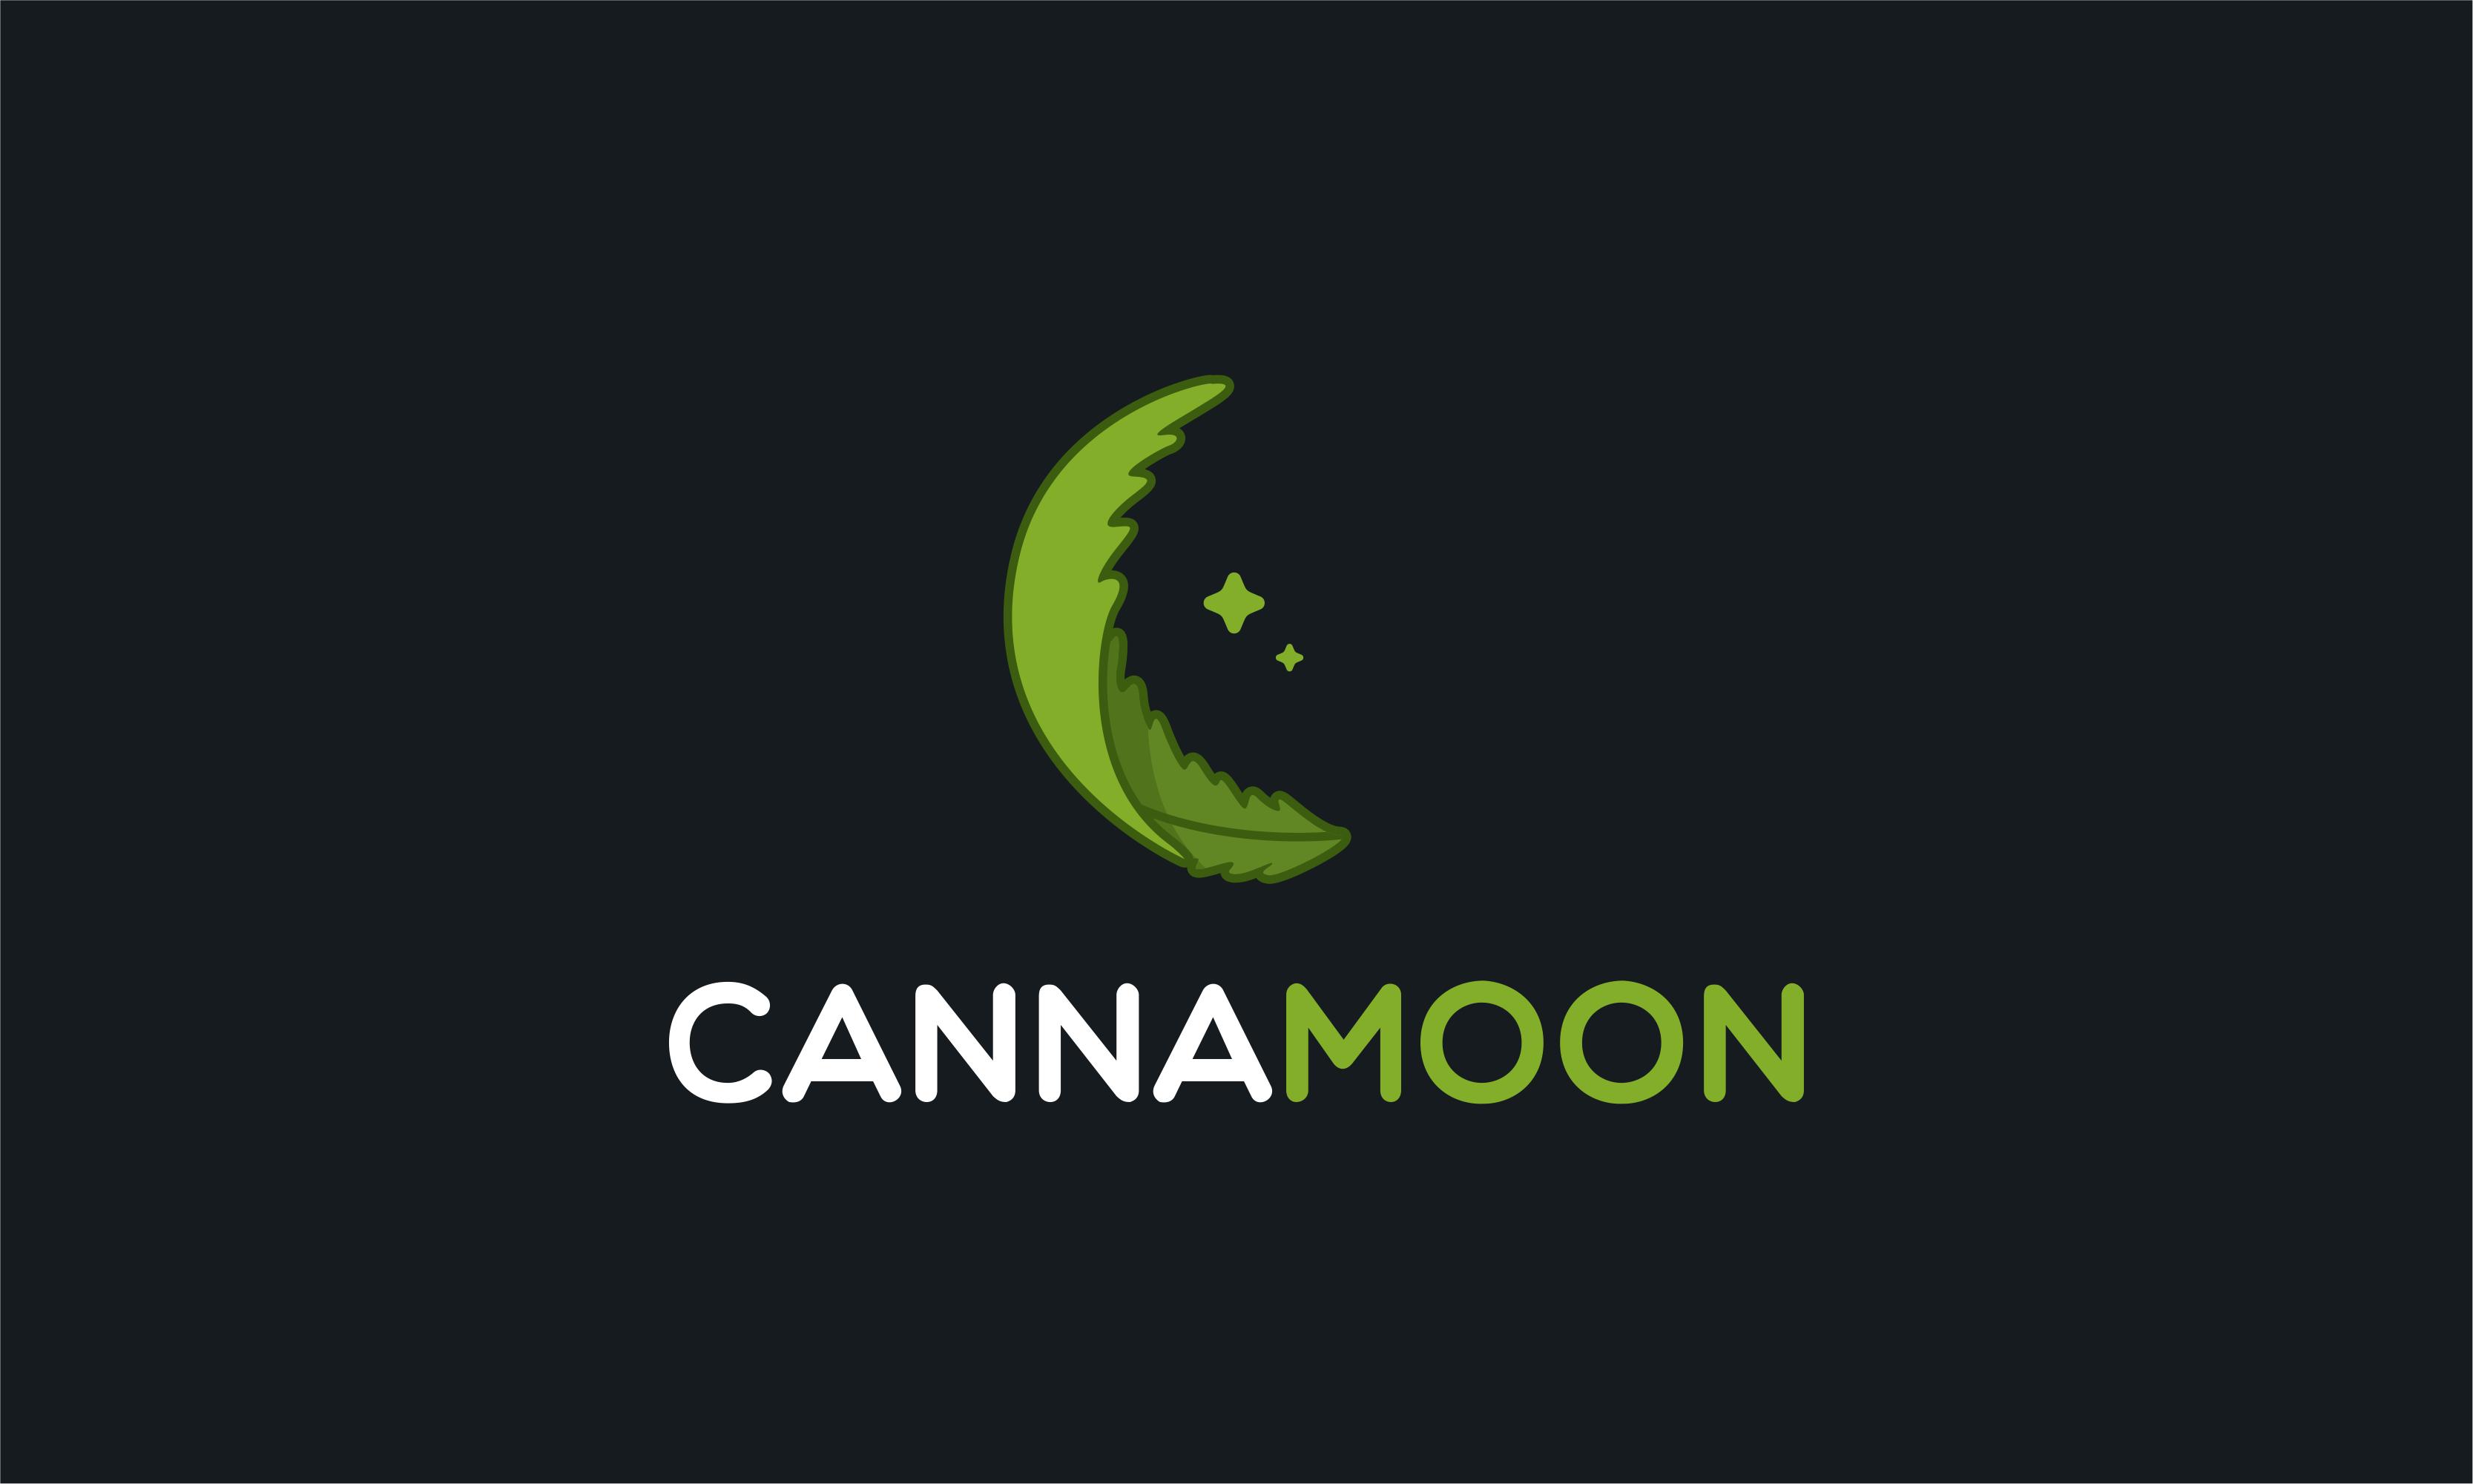 Cannamoon